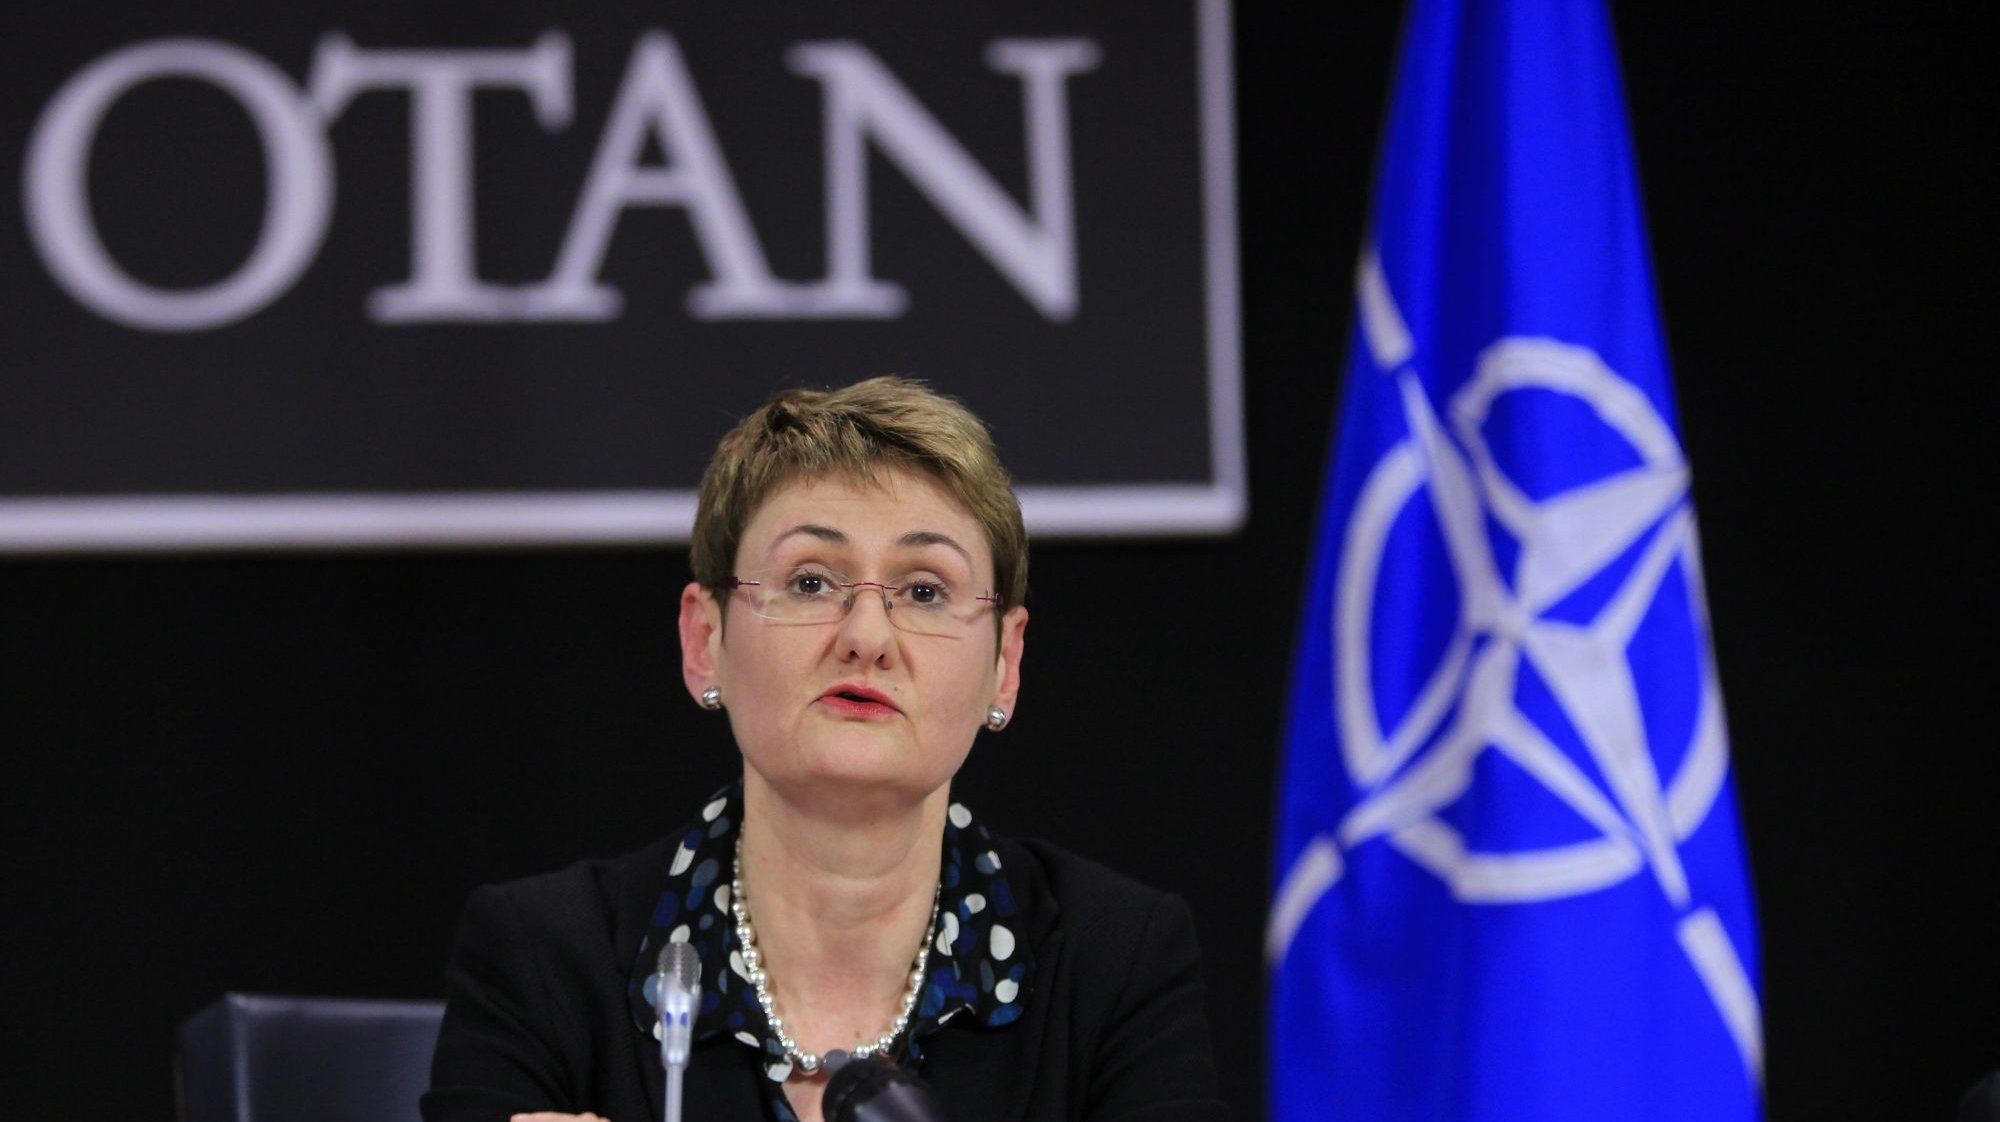 Oana Lungescu, porta-voz da NATO